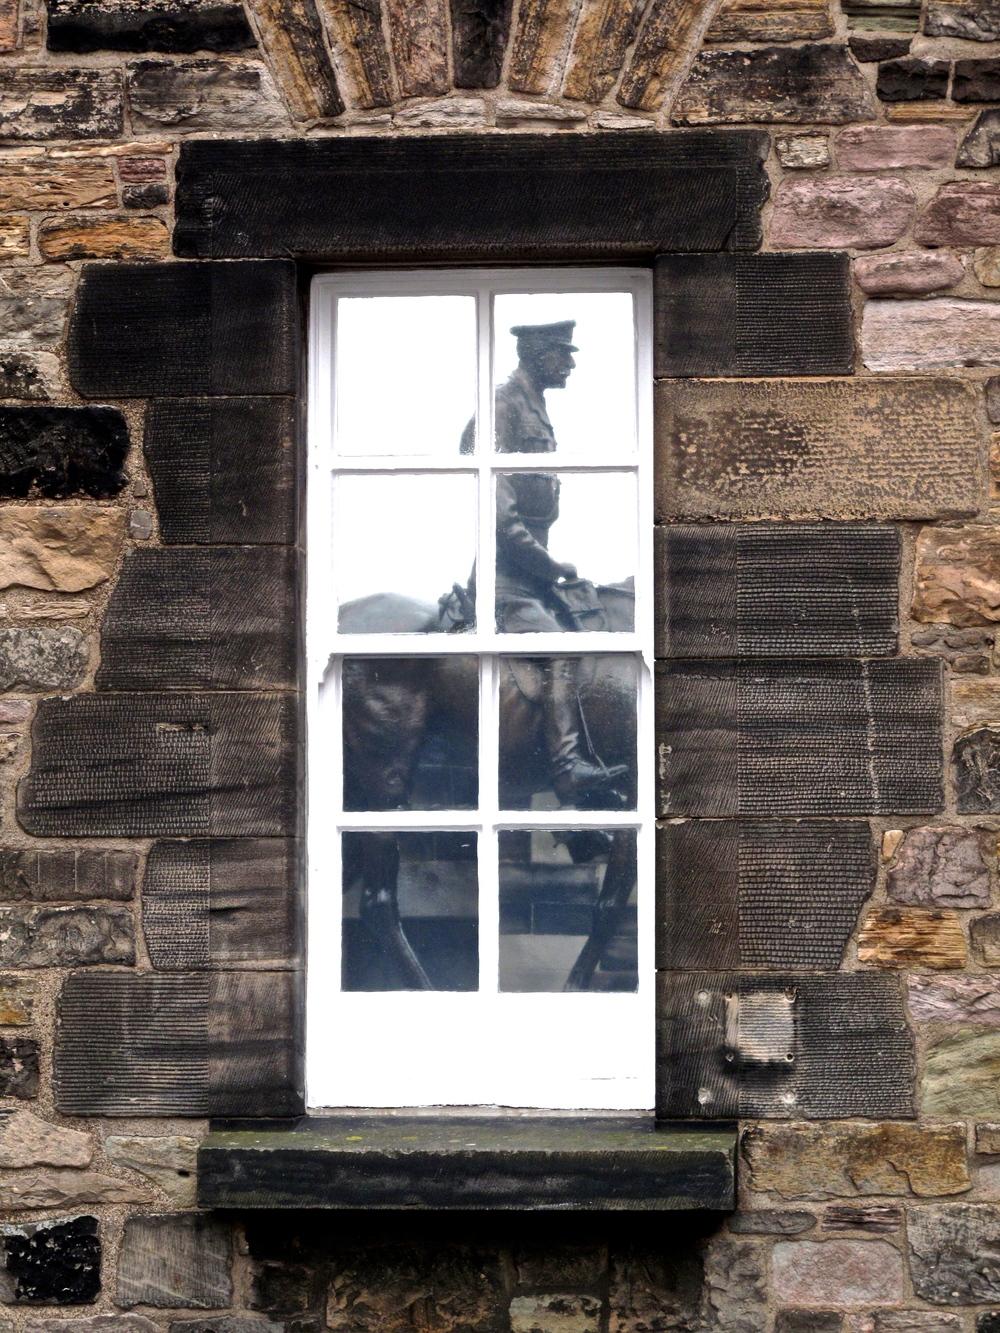 Window reflection of an equestrian statue in Edinburgh Castle.